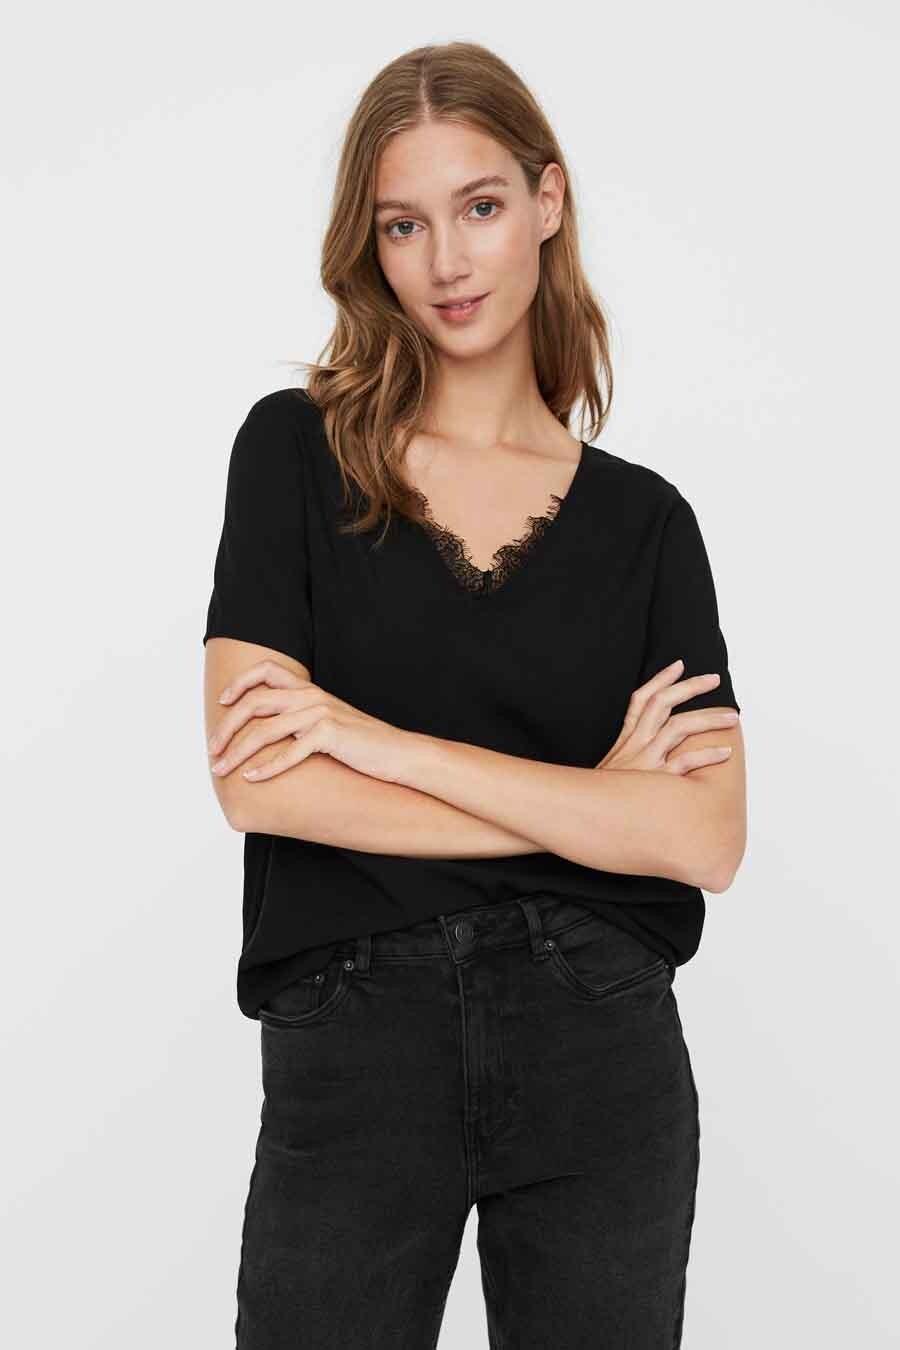 Vero Moda® Blouse korte mouwen, Zwart, Dames, Maat: XS/S/M